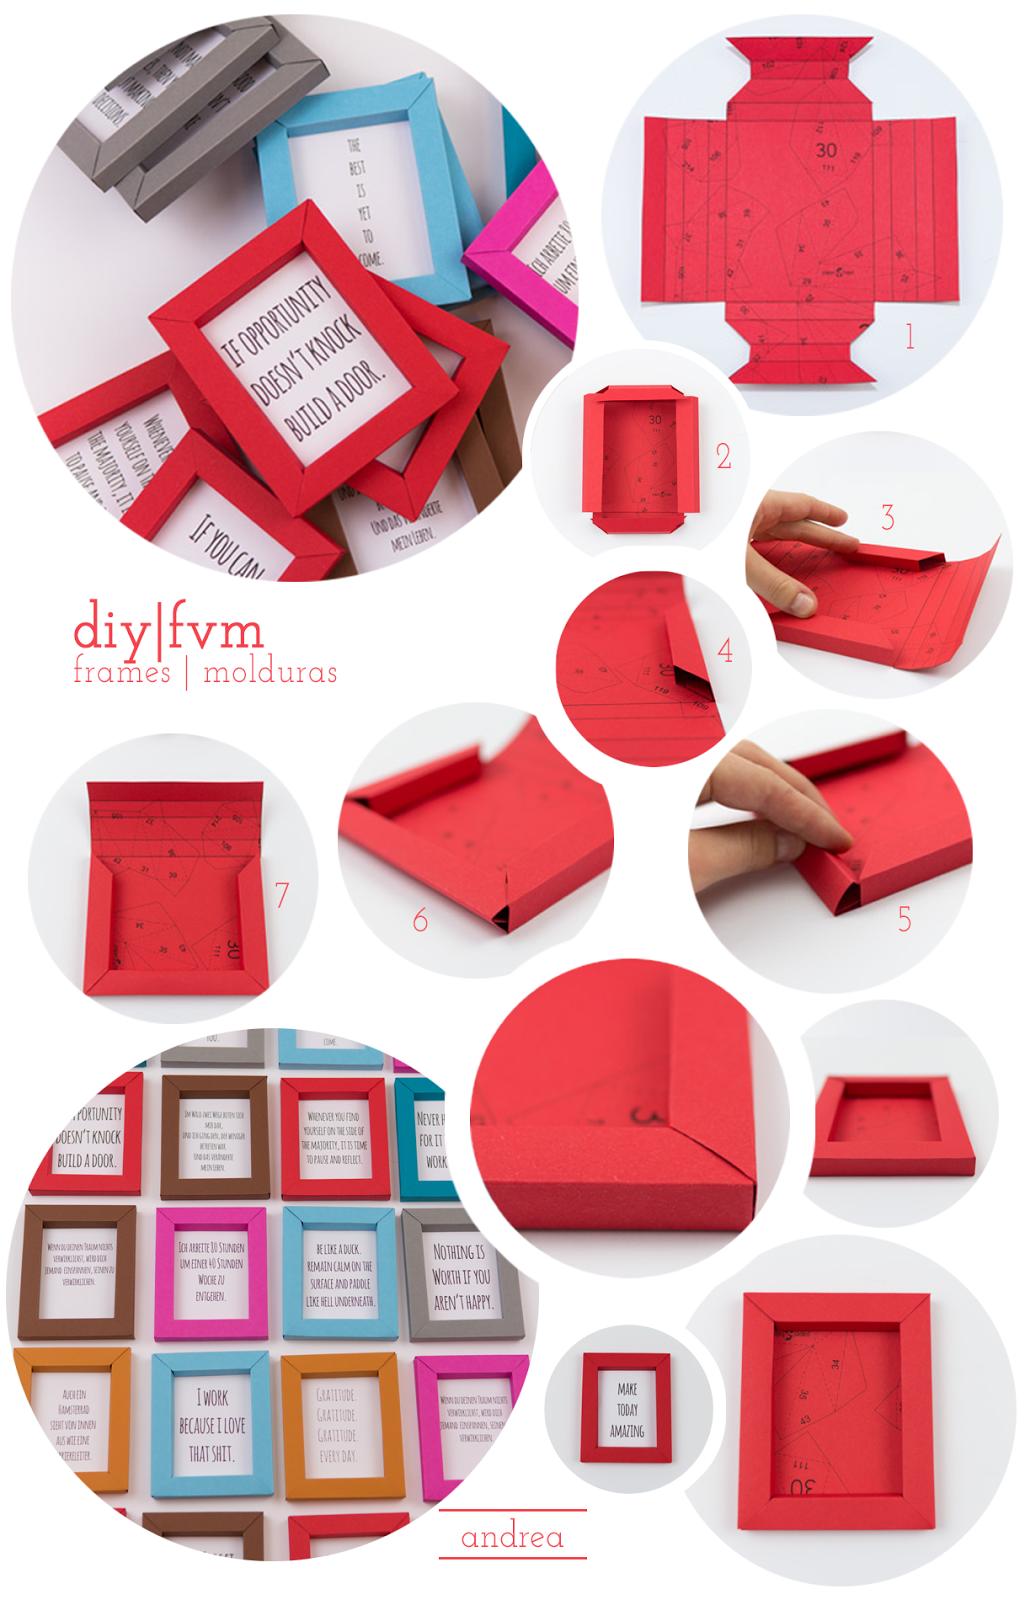 molduras em papel | enmarcar cuadros de. carton | Pinterest | Papel ...